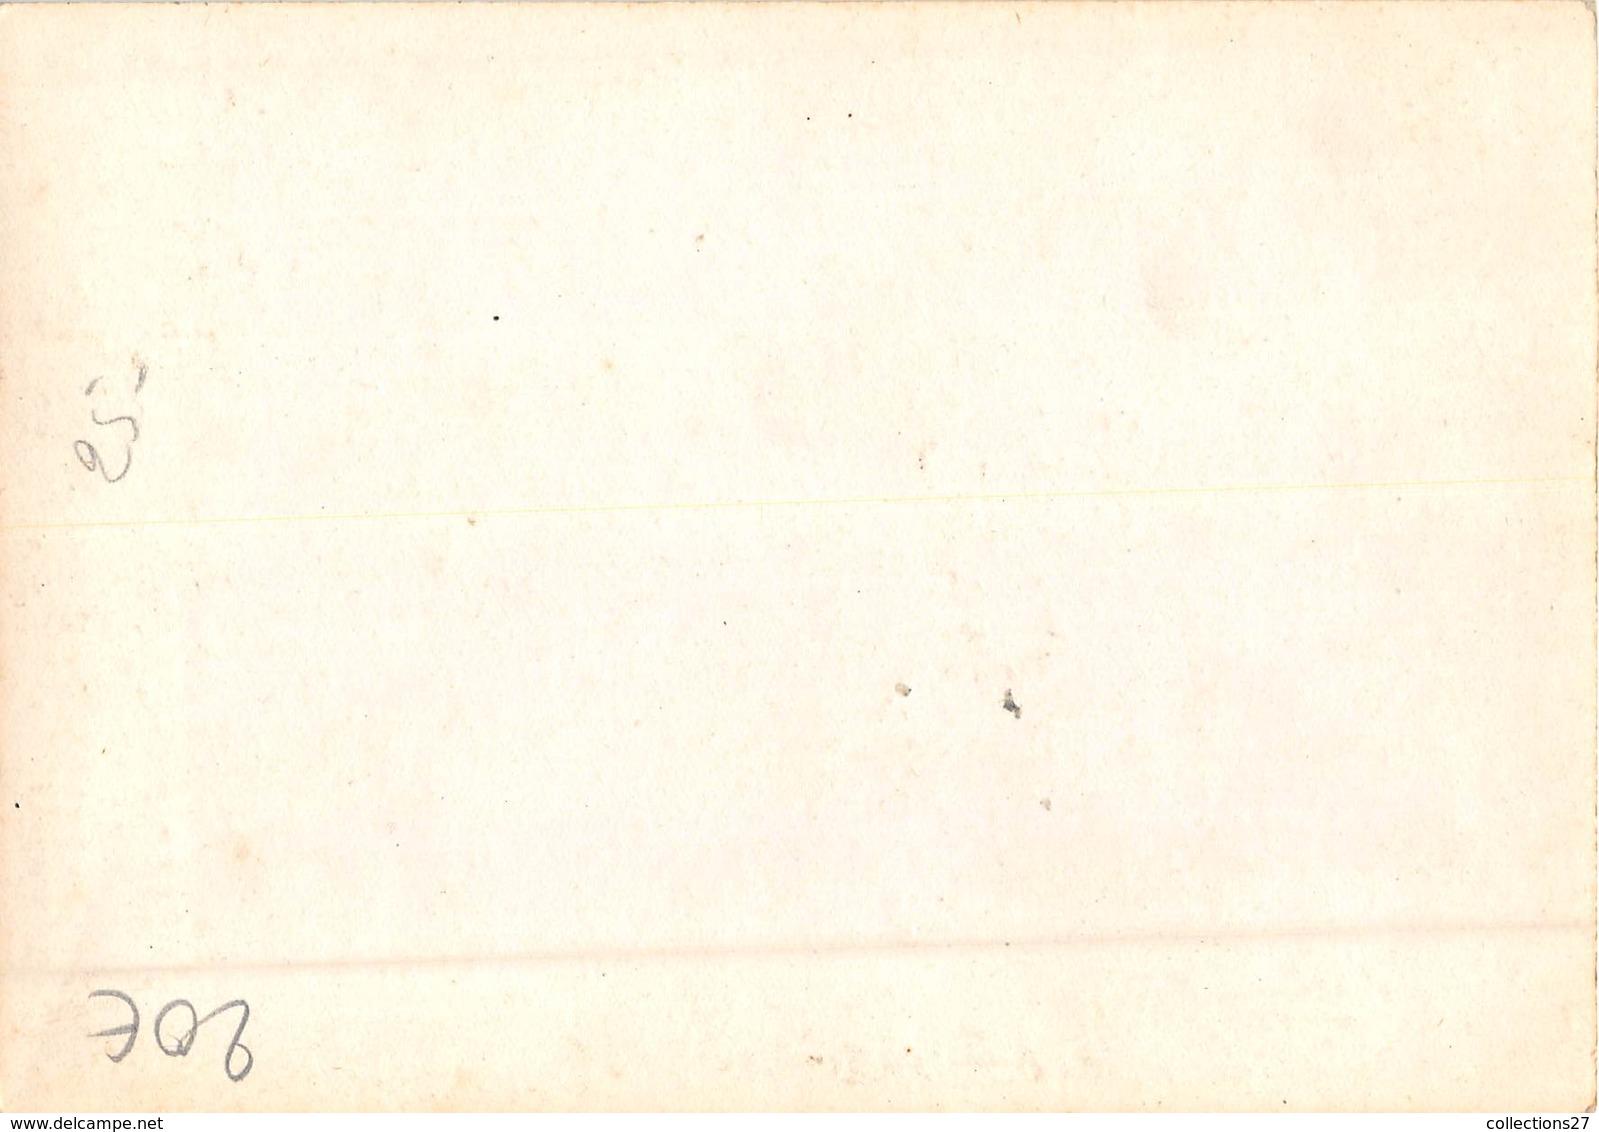 GRAND PRIX DE BOULOGNE- DIMANCHE 4 MAI 1947 -QUENGNET, SCALBI, MARINELLI - Cyclisme